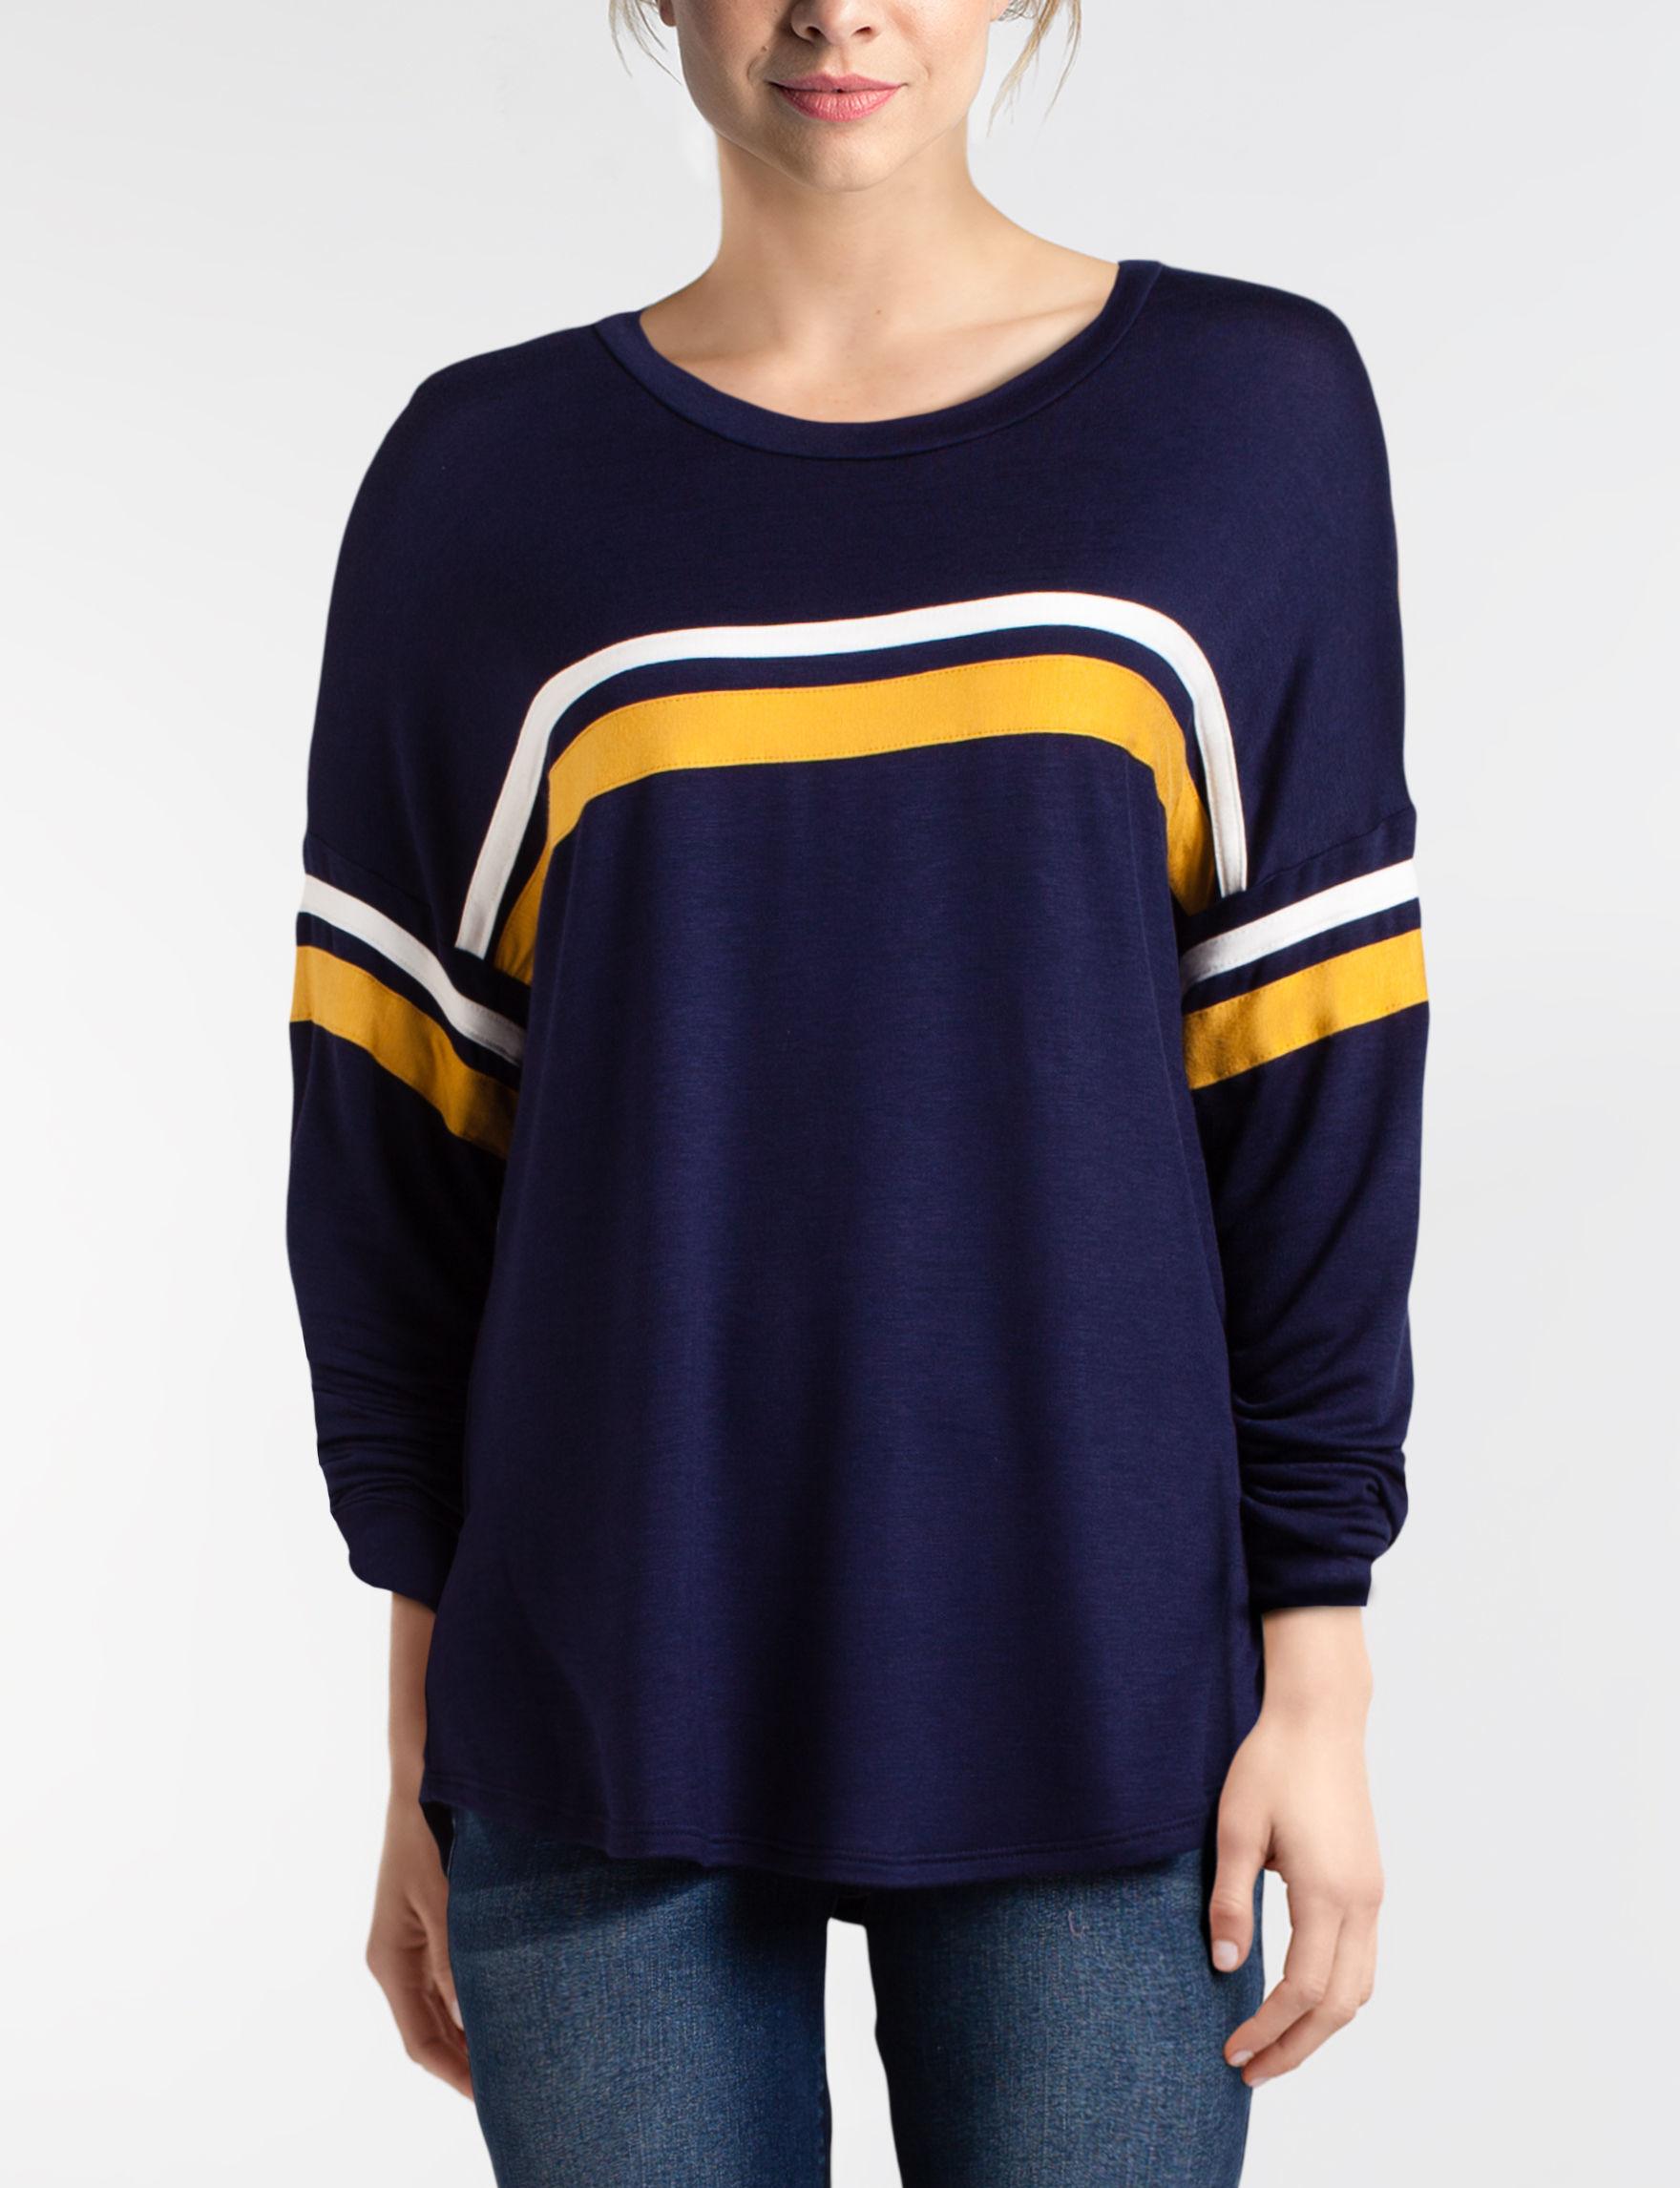 Signature Studio Navy Shirts & Blouses